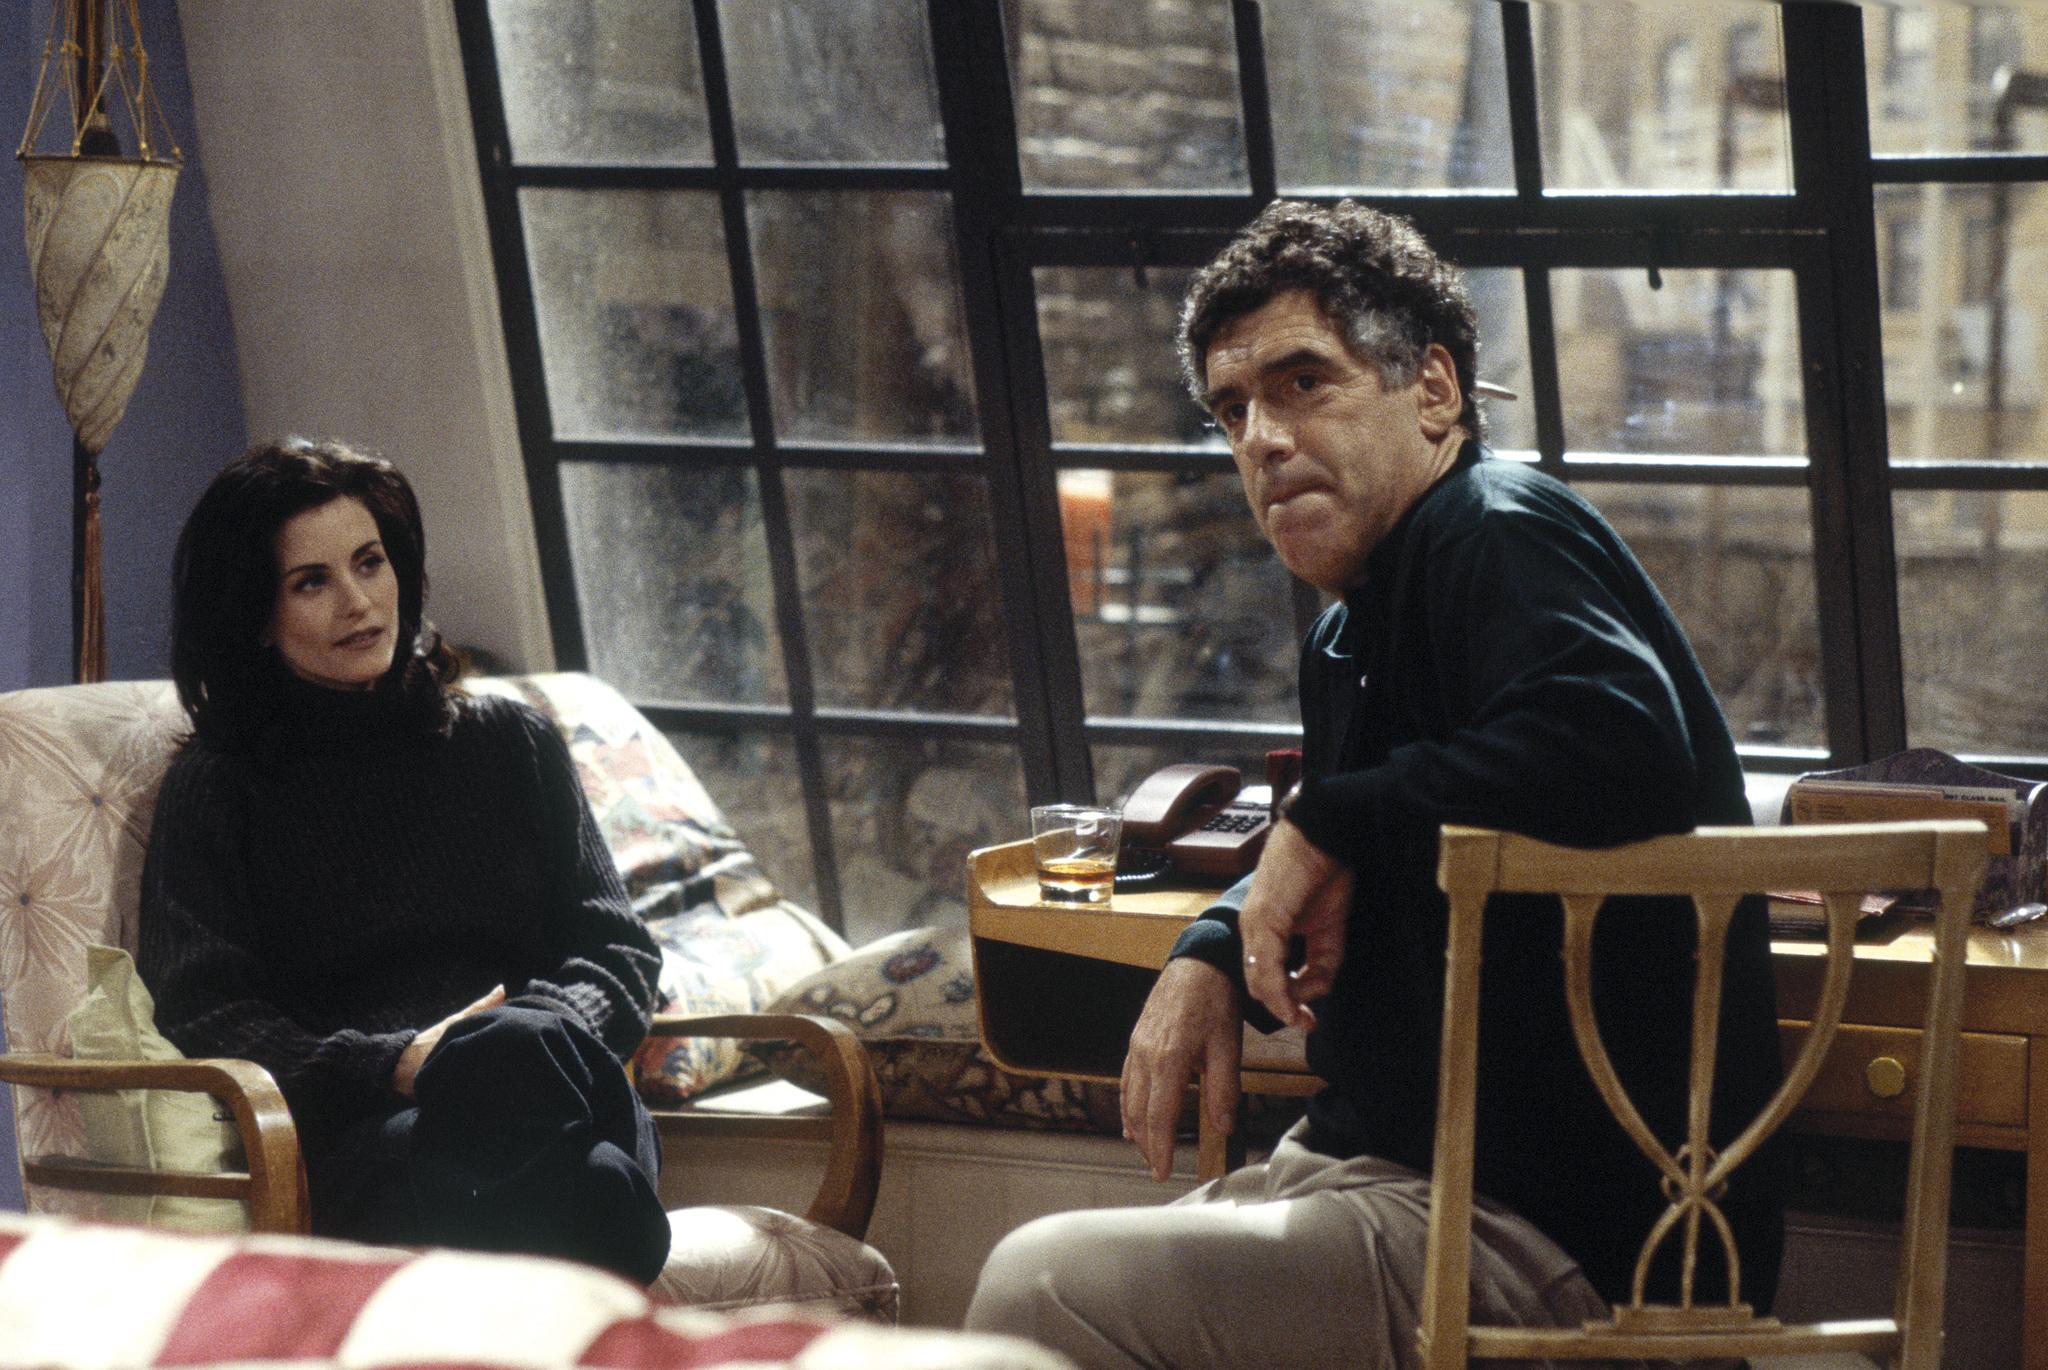 Friends: The One Where Nana Dies Twice | Season 1 | Episode 8